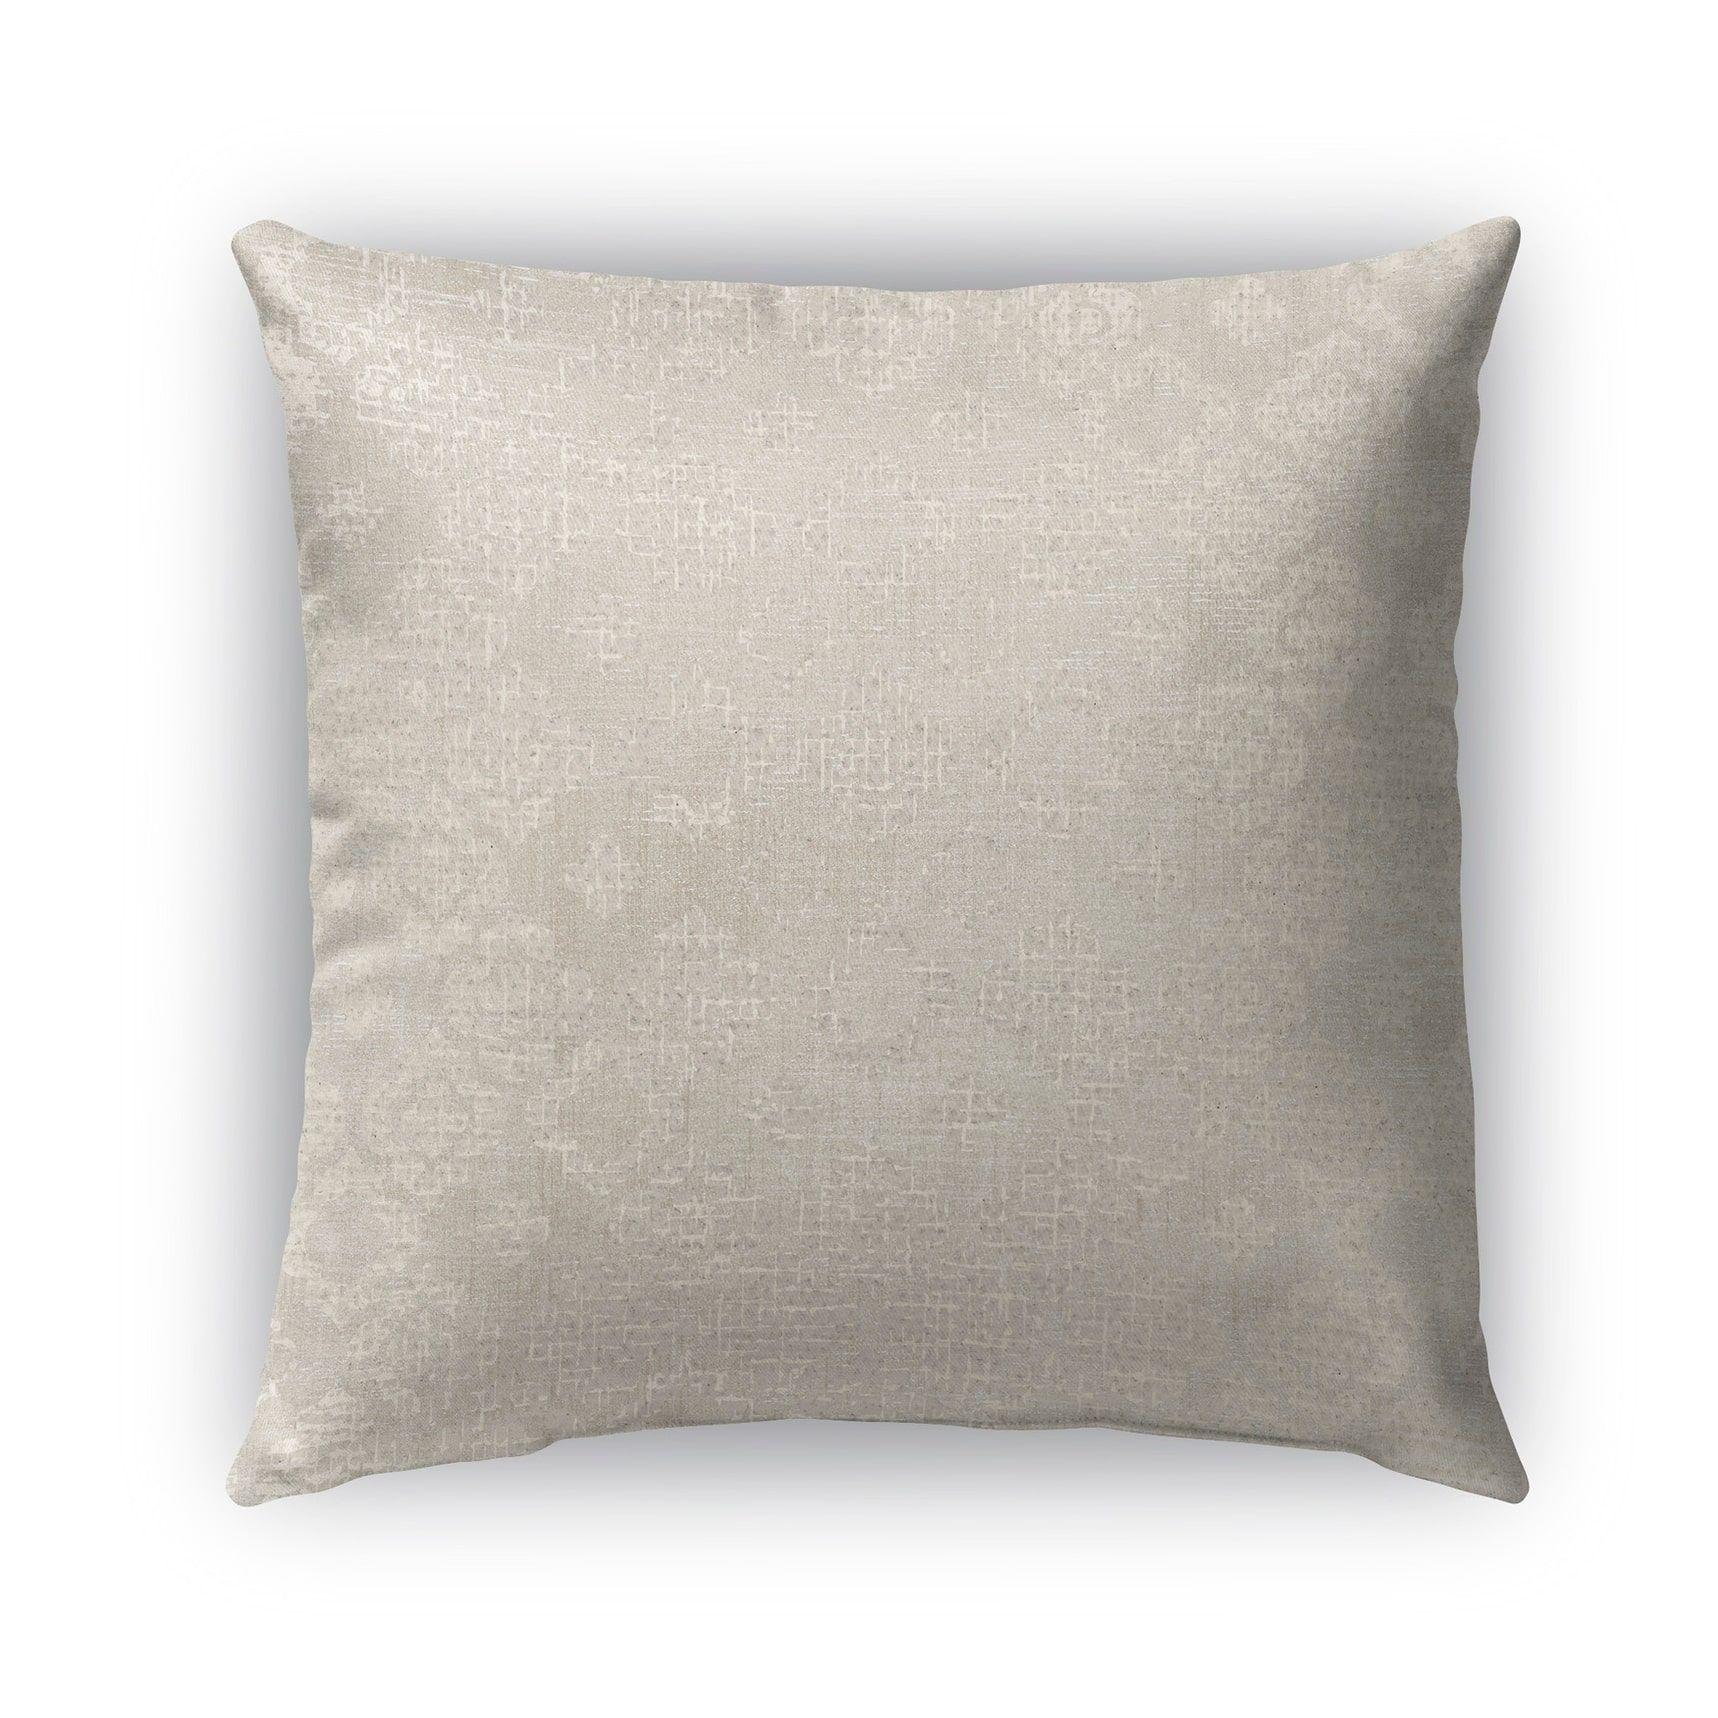 26X26 Pillow Insert Beauteous Kavka Designs Ivory Grey Versilia Outdoor Pillow With Insert 26 X Decorating Design